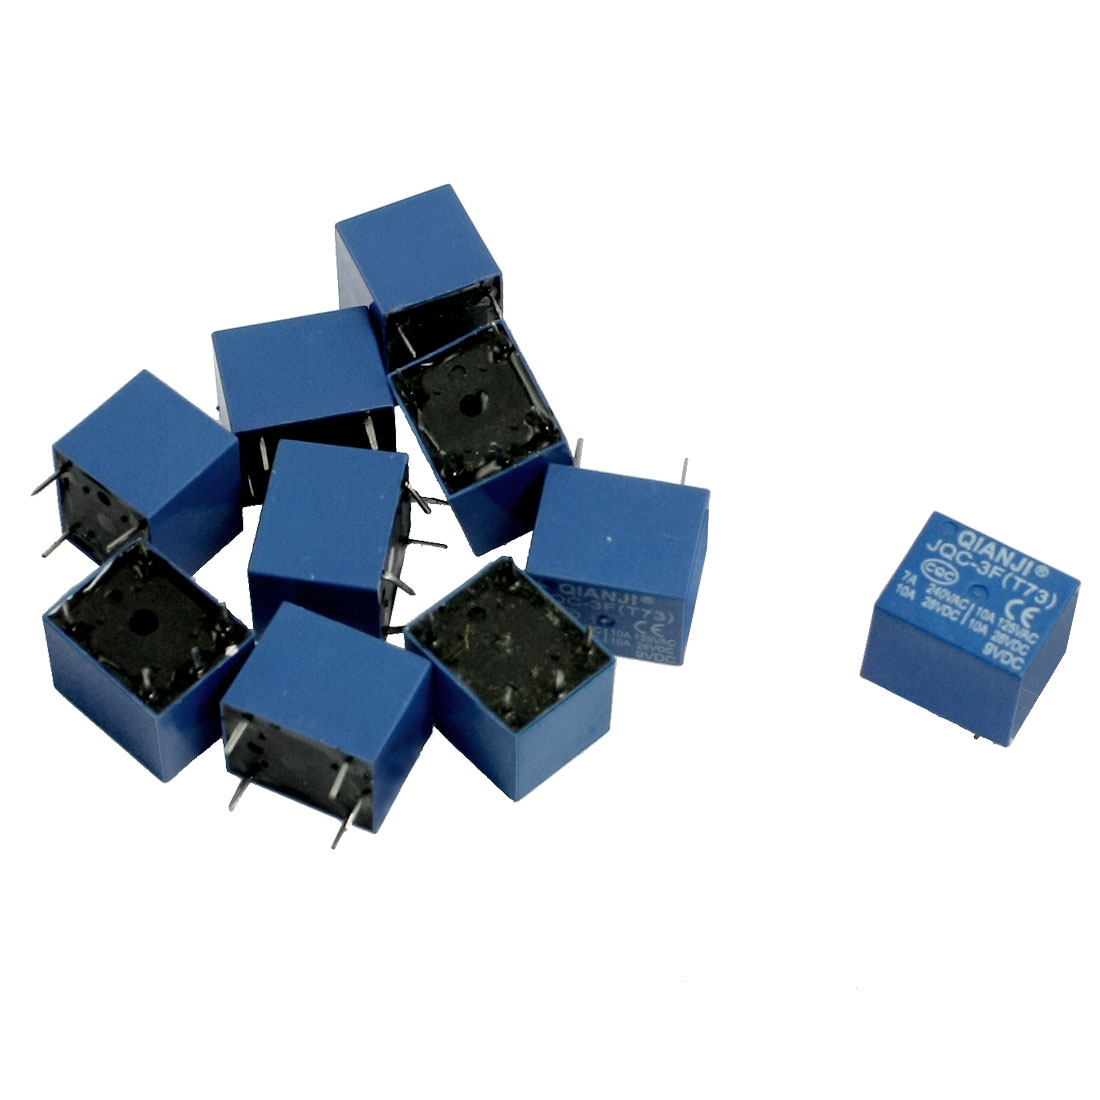 10 Pcs DC 9V Coil 10A SPST 5 Pin Electromagnetic Relays PCB Type JQC-3F